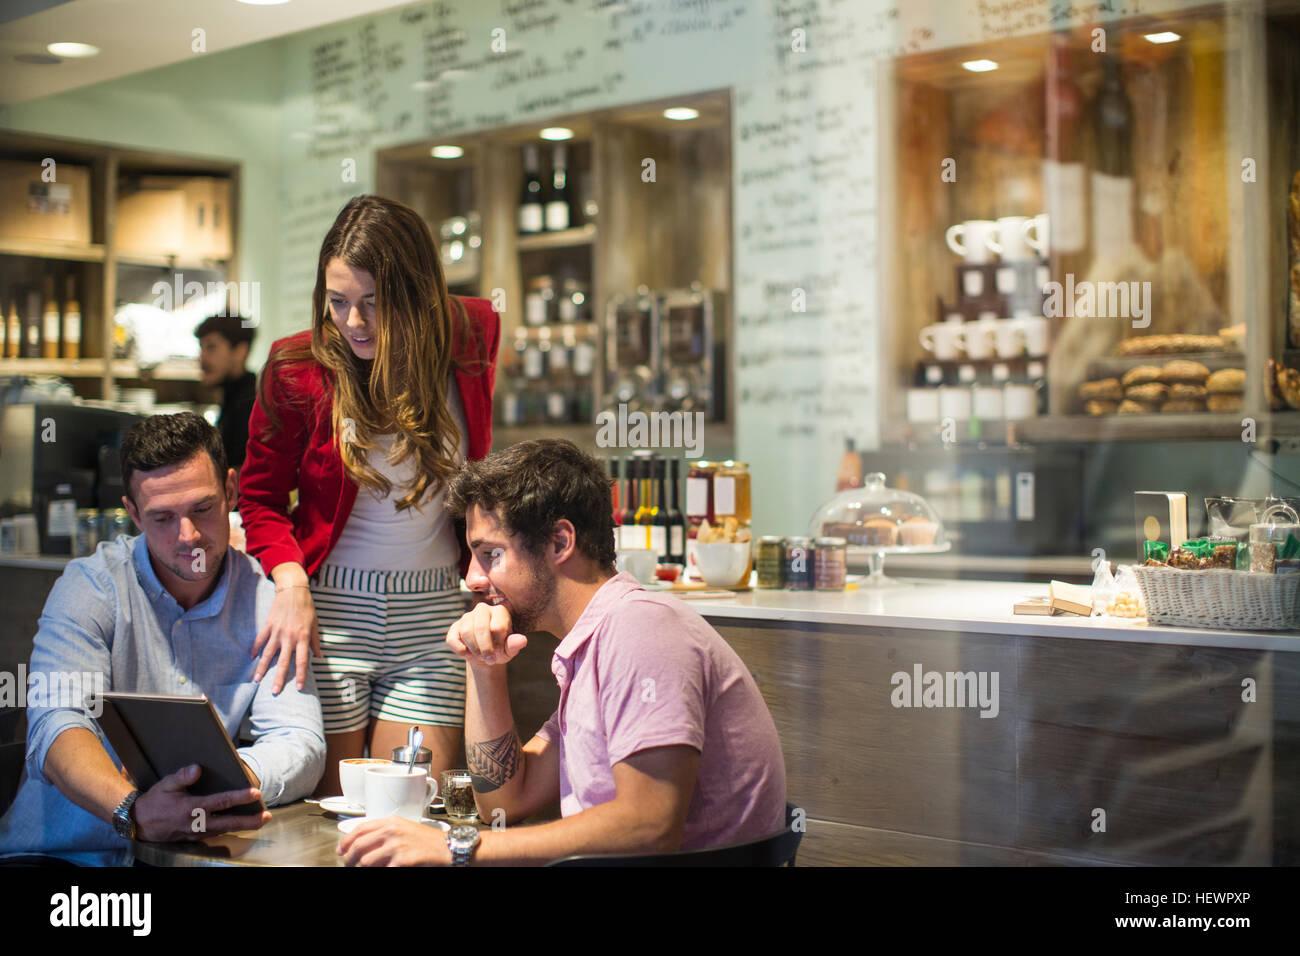 Les amis masculins et féminins dans cafe looking at digital tablet Photo Stock